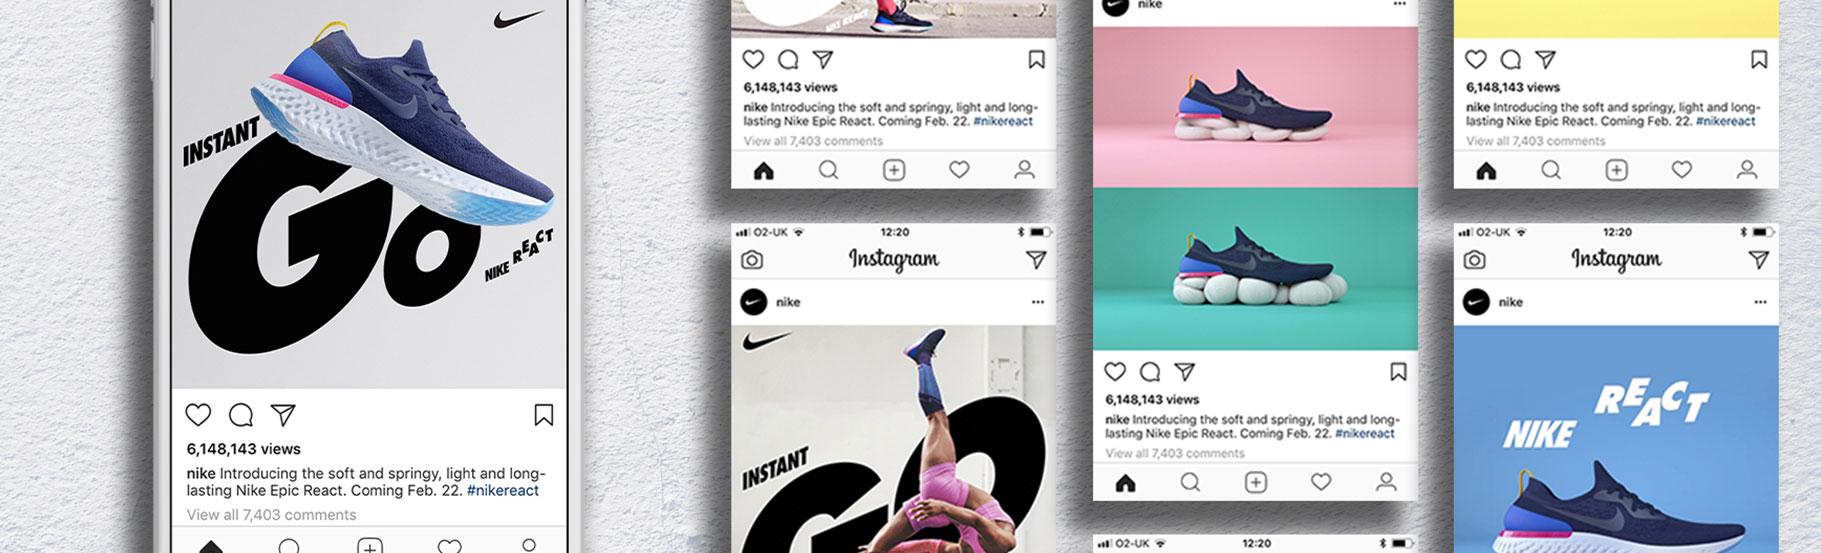 Sive Nike patike